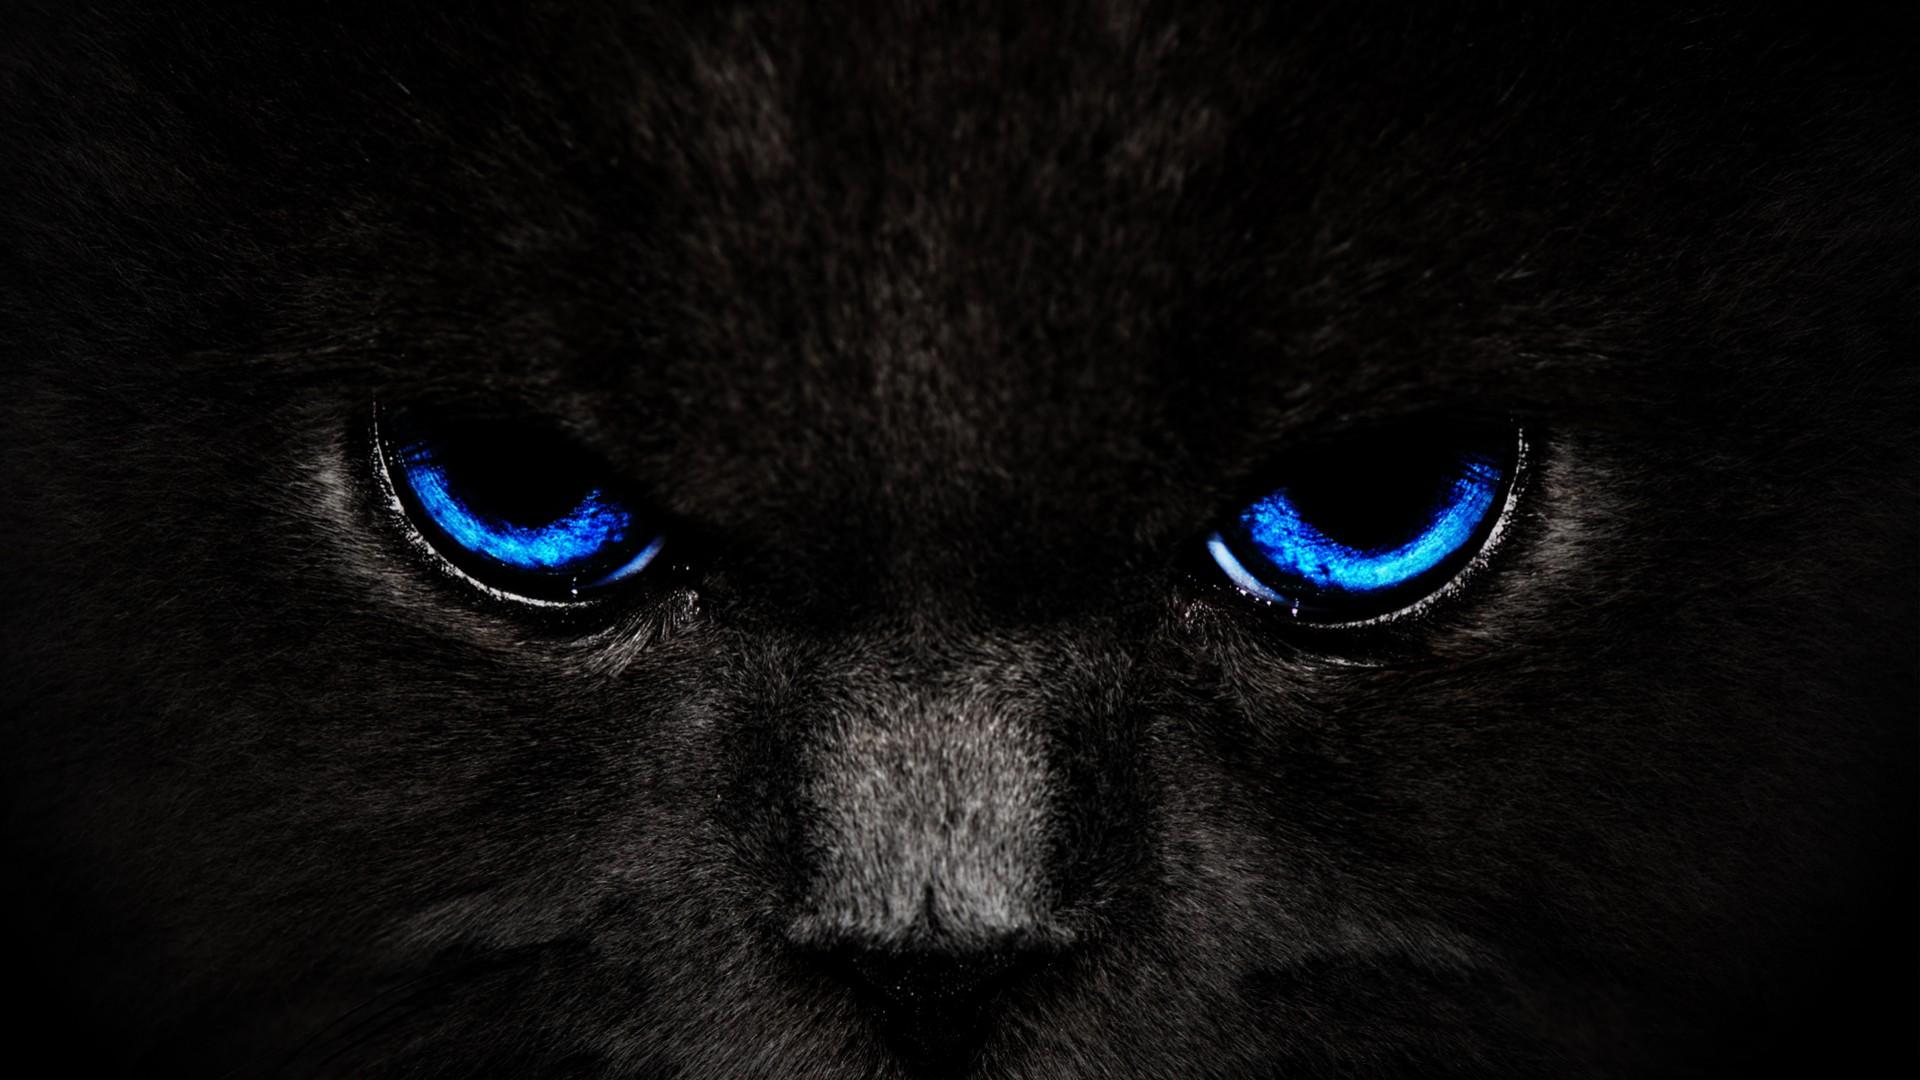 Download Cat Blue Eyes Free Wallpaper 1920x1080   Full HD Wallpapers